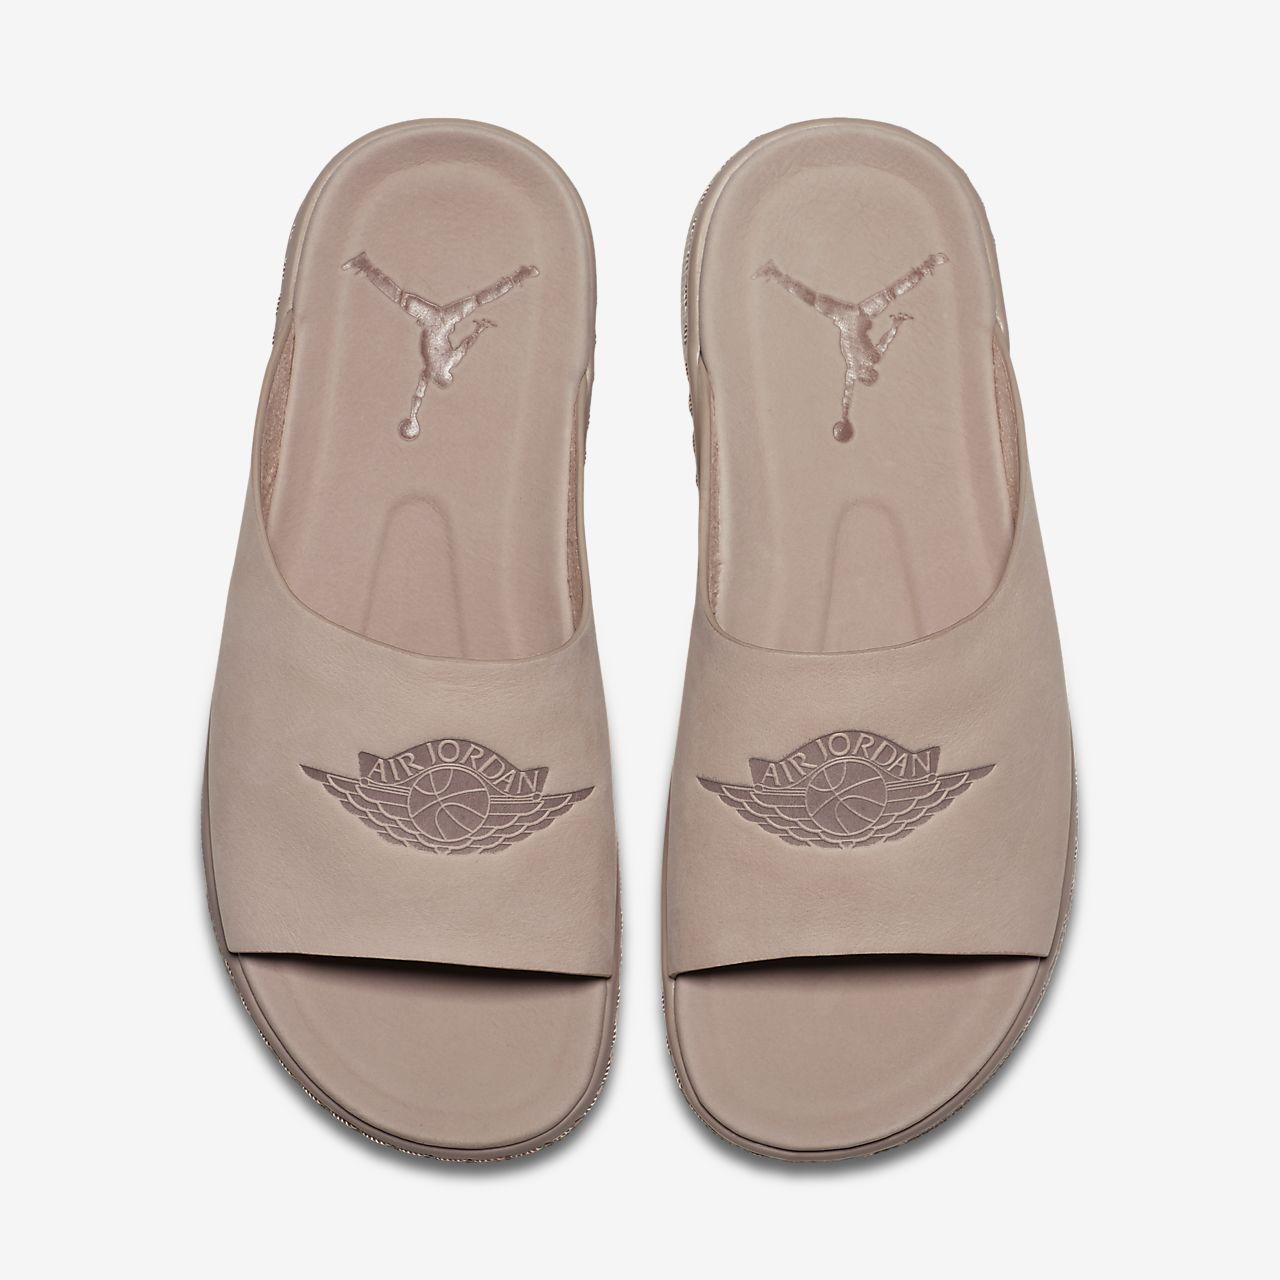 WMNS Nike Air Jordan Modero 1 SZ 12 Particle Beige Pink Sandal Slide AO9919-200